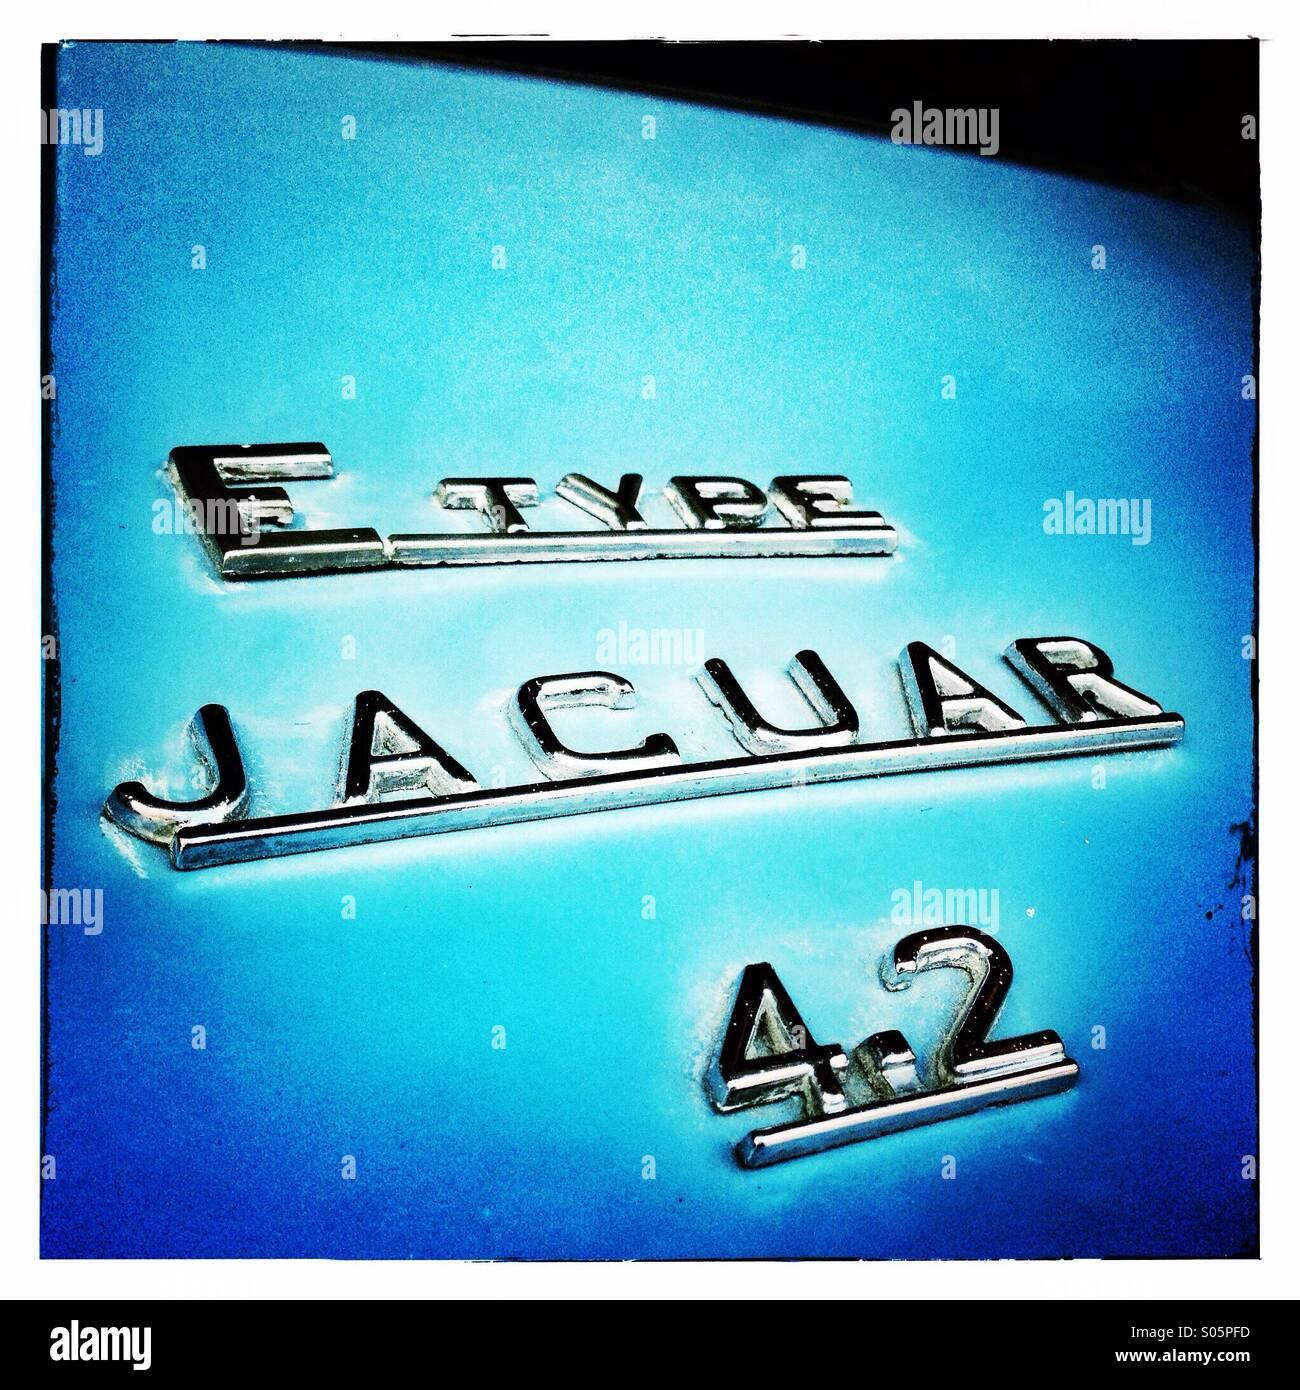 E Type Jaguar car bonnet with chrome name plate Stock Photo